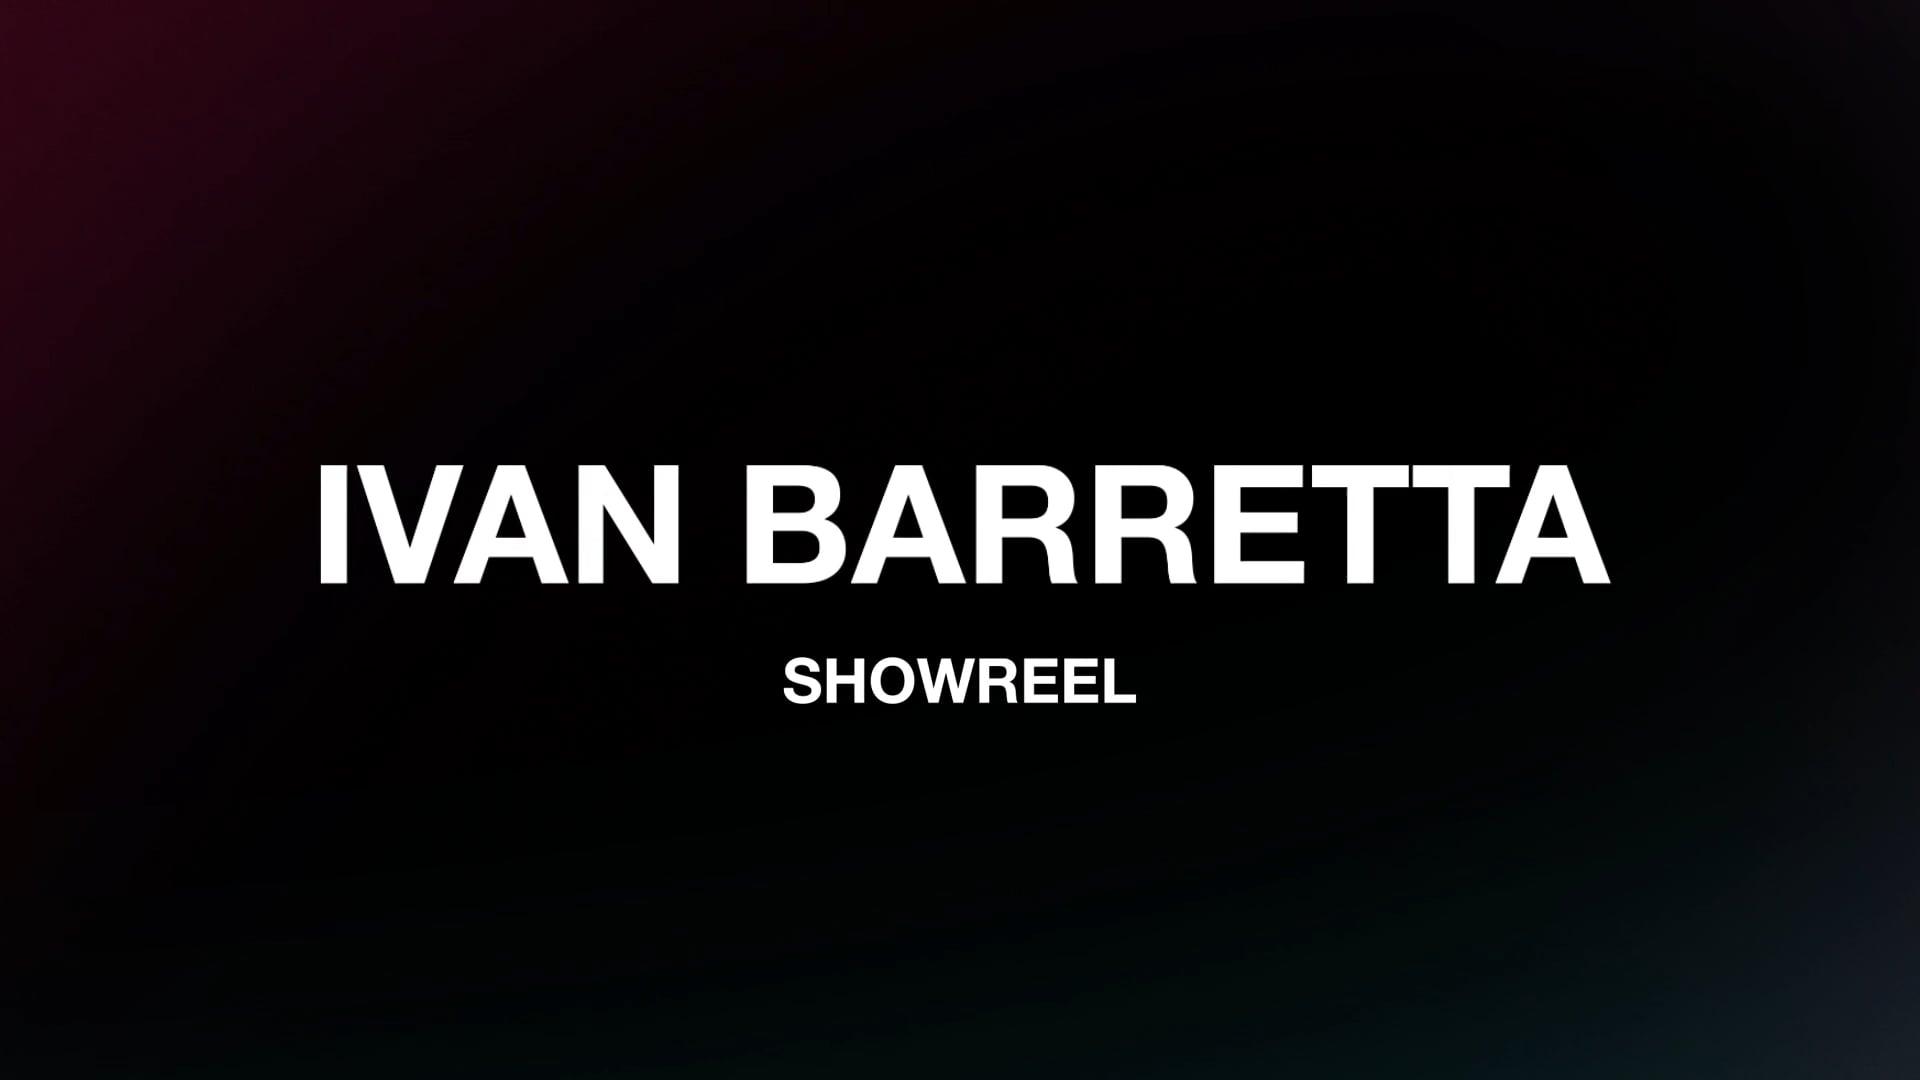 Ivan Barretta Showreel